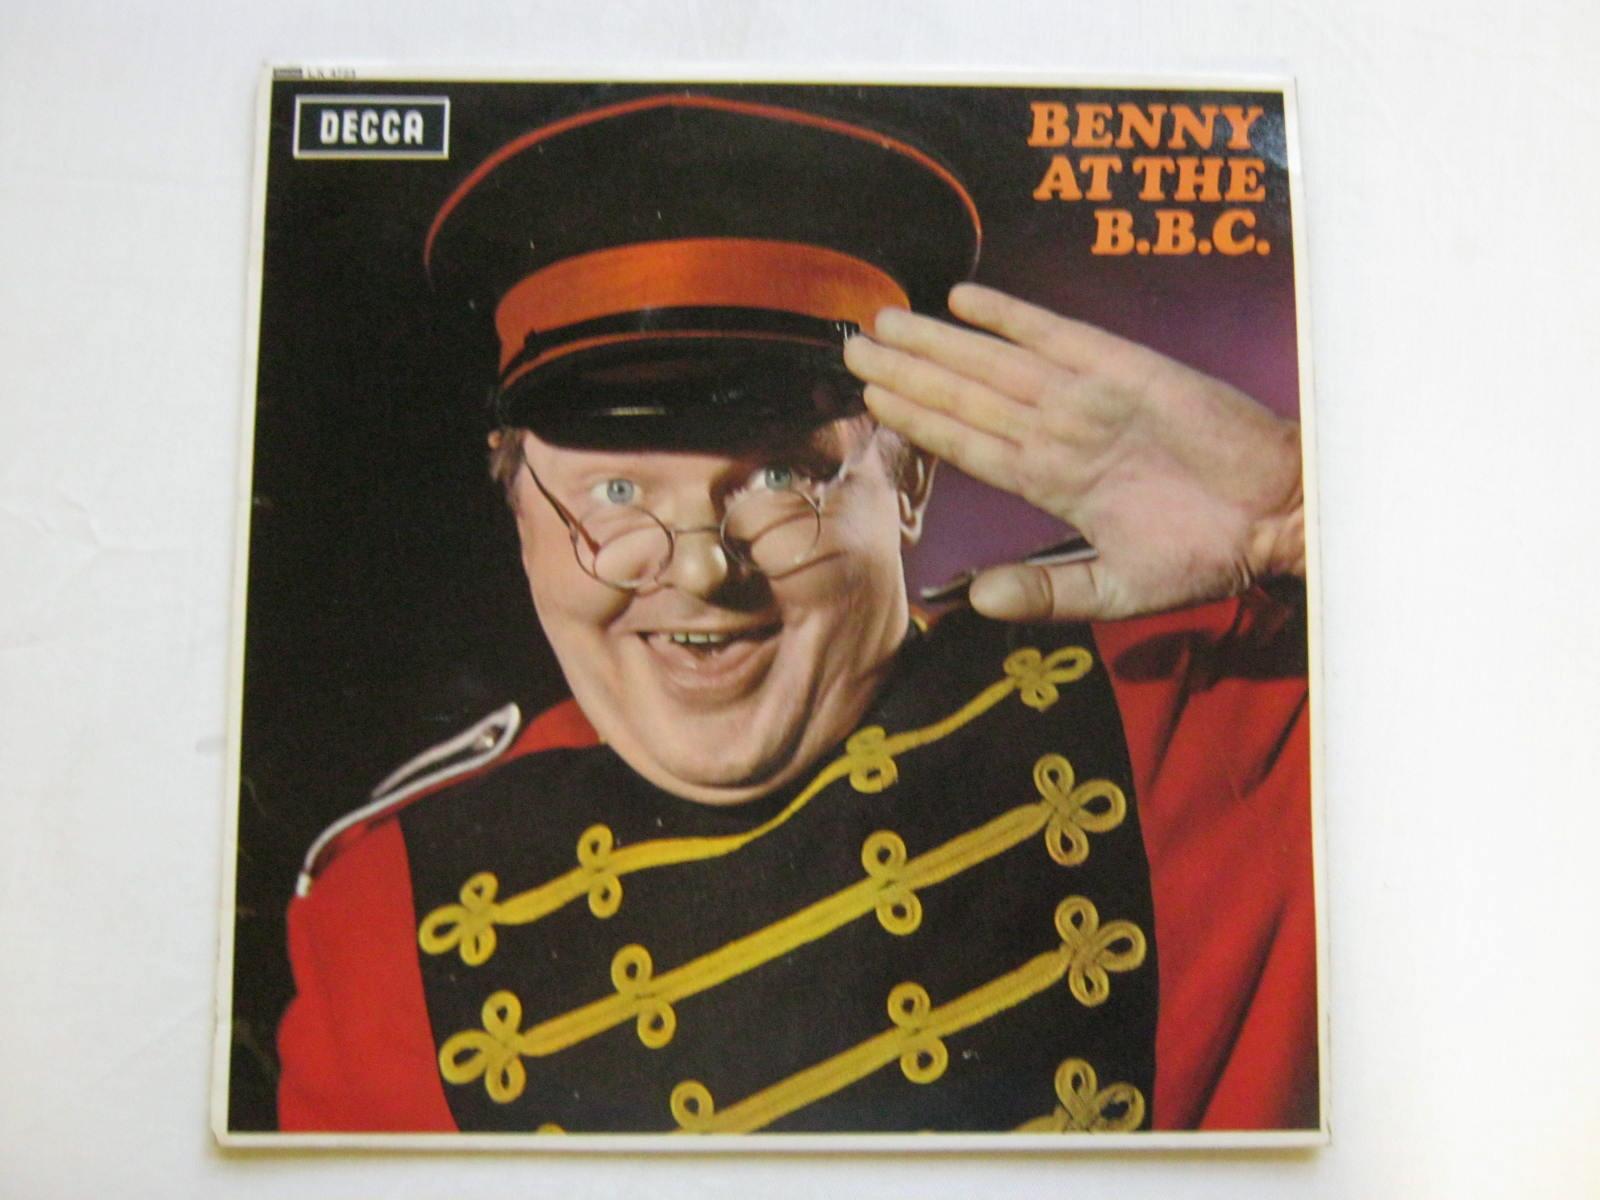 Benny At The B.b.c